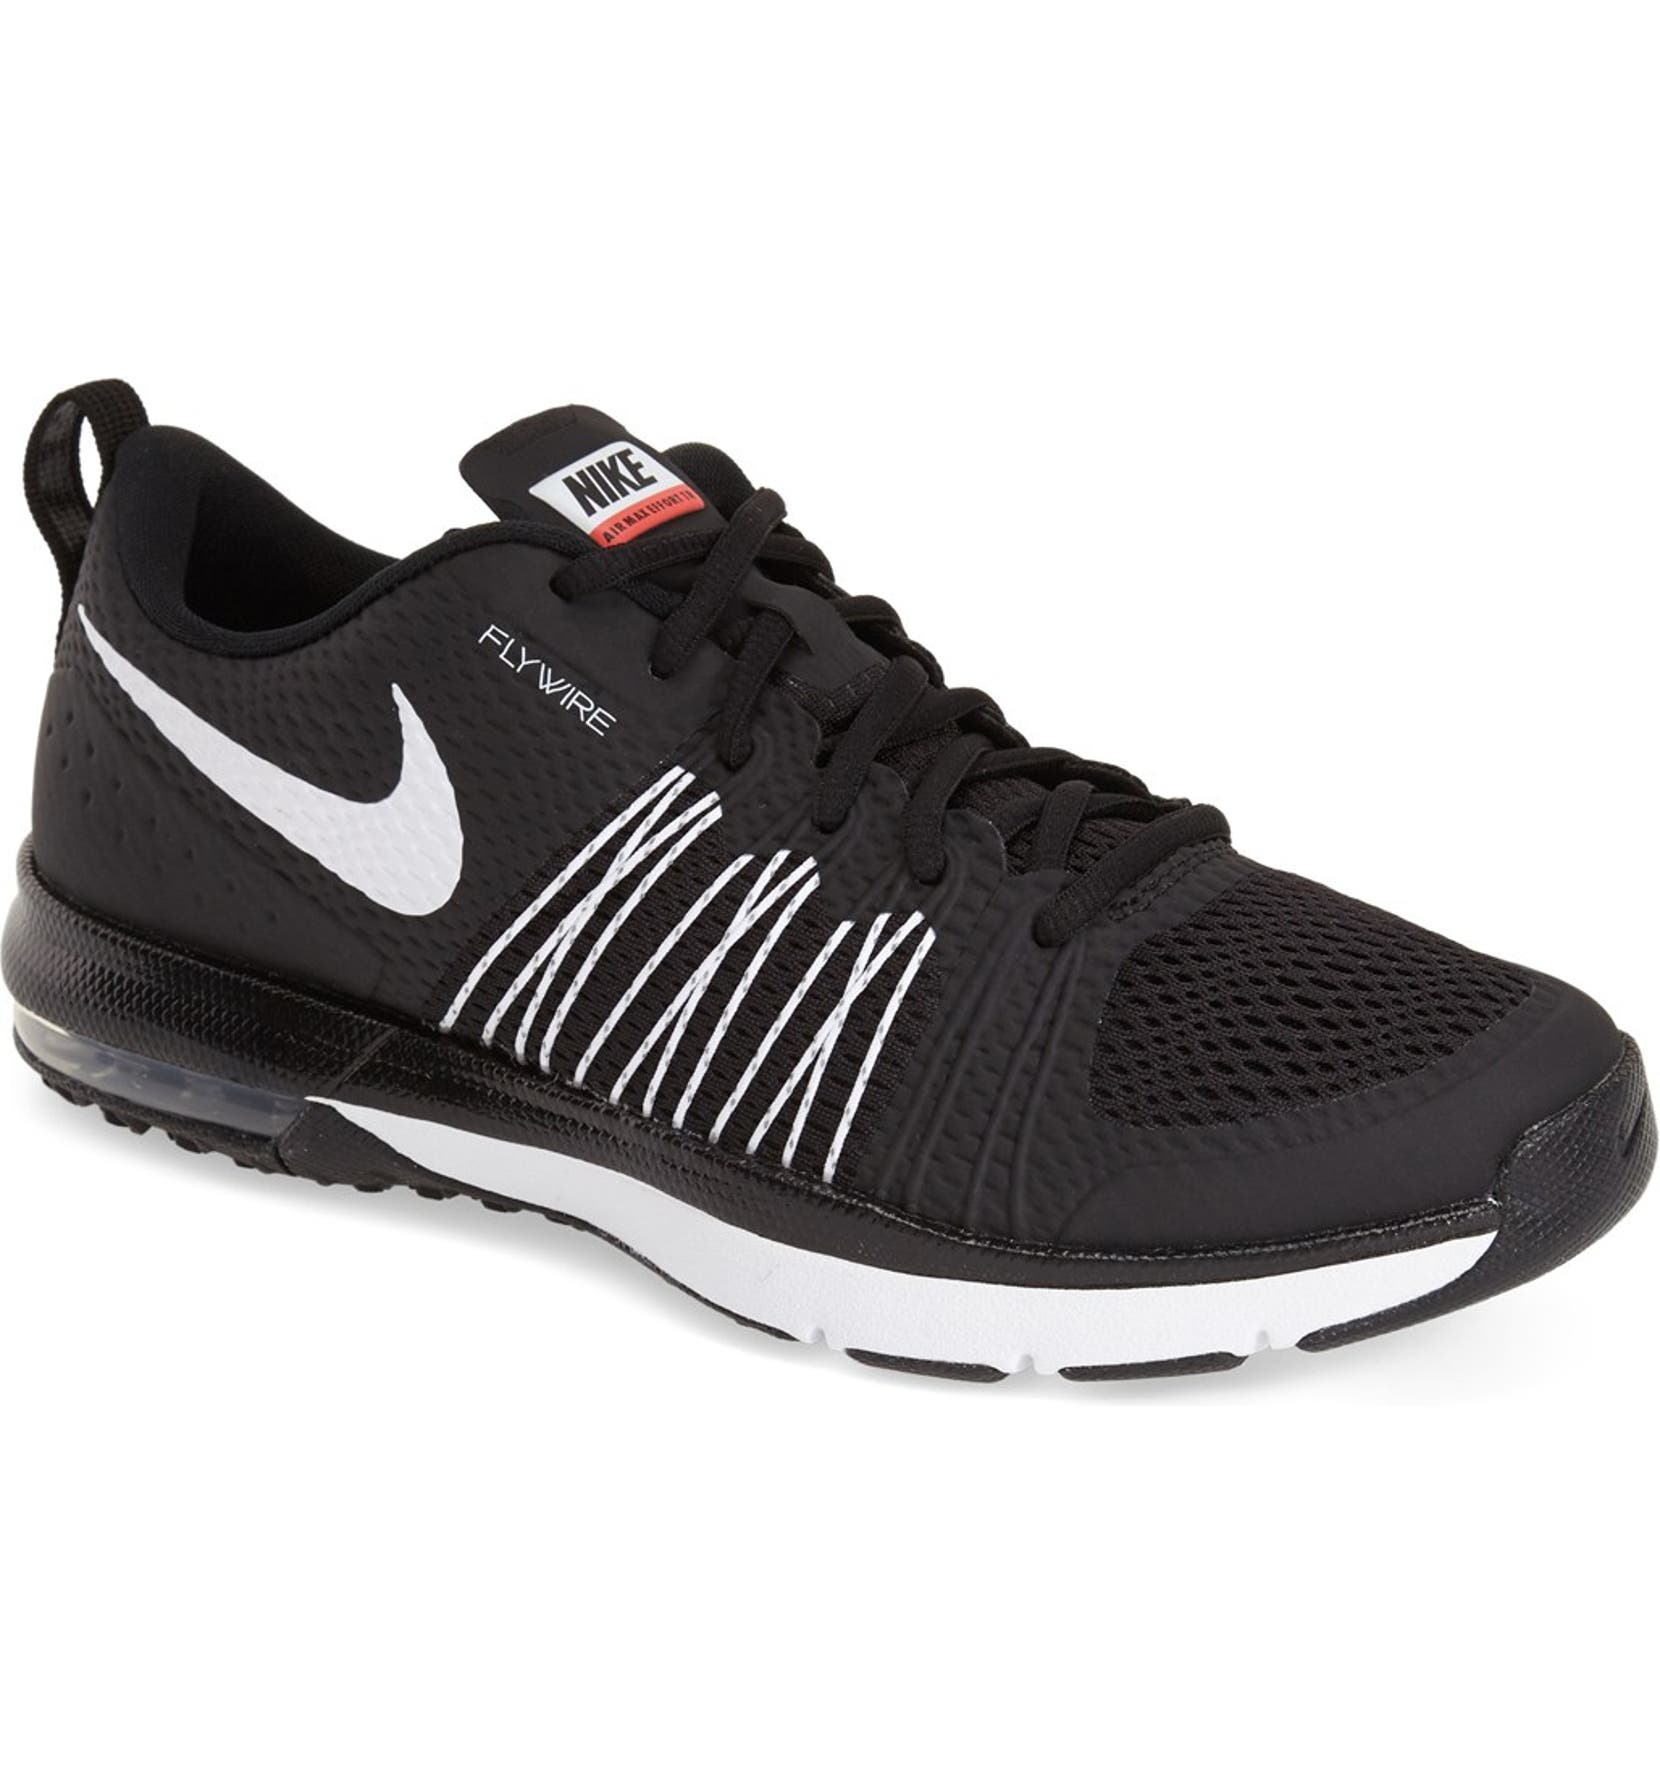 on sale 323bc 25ab4 Nike  Air Max Effort TR  Training Shoe (Men)   Nordstrom